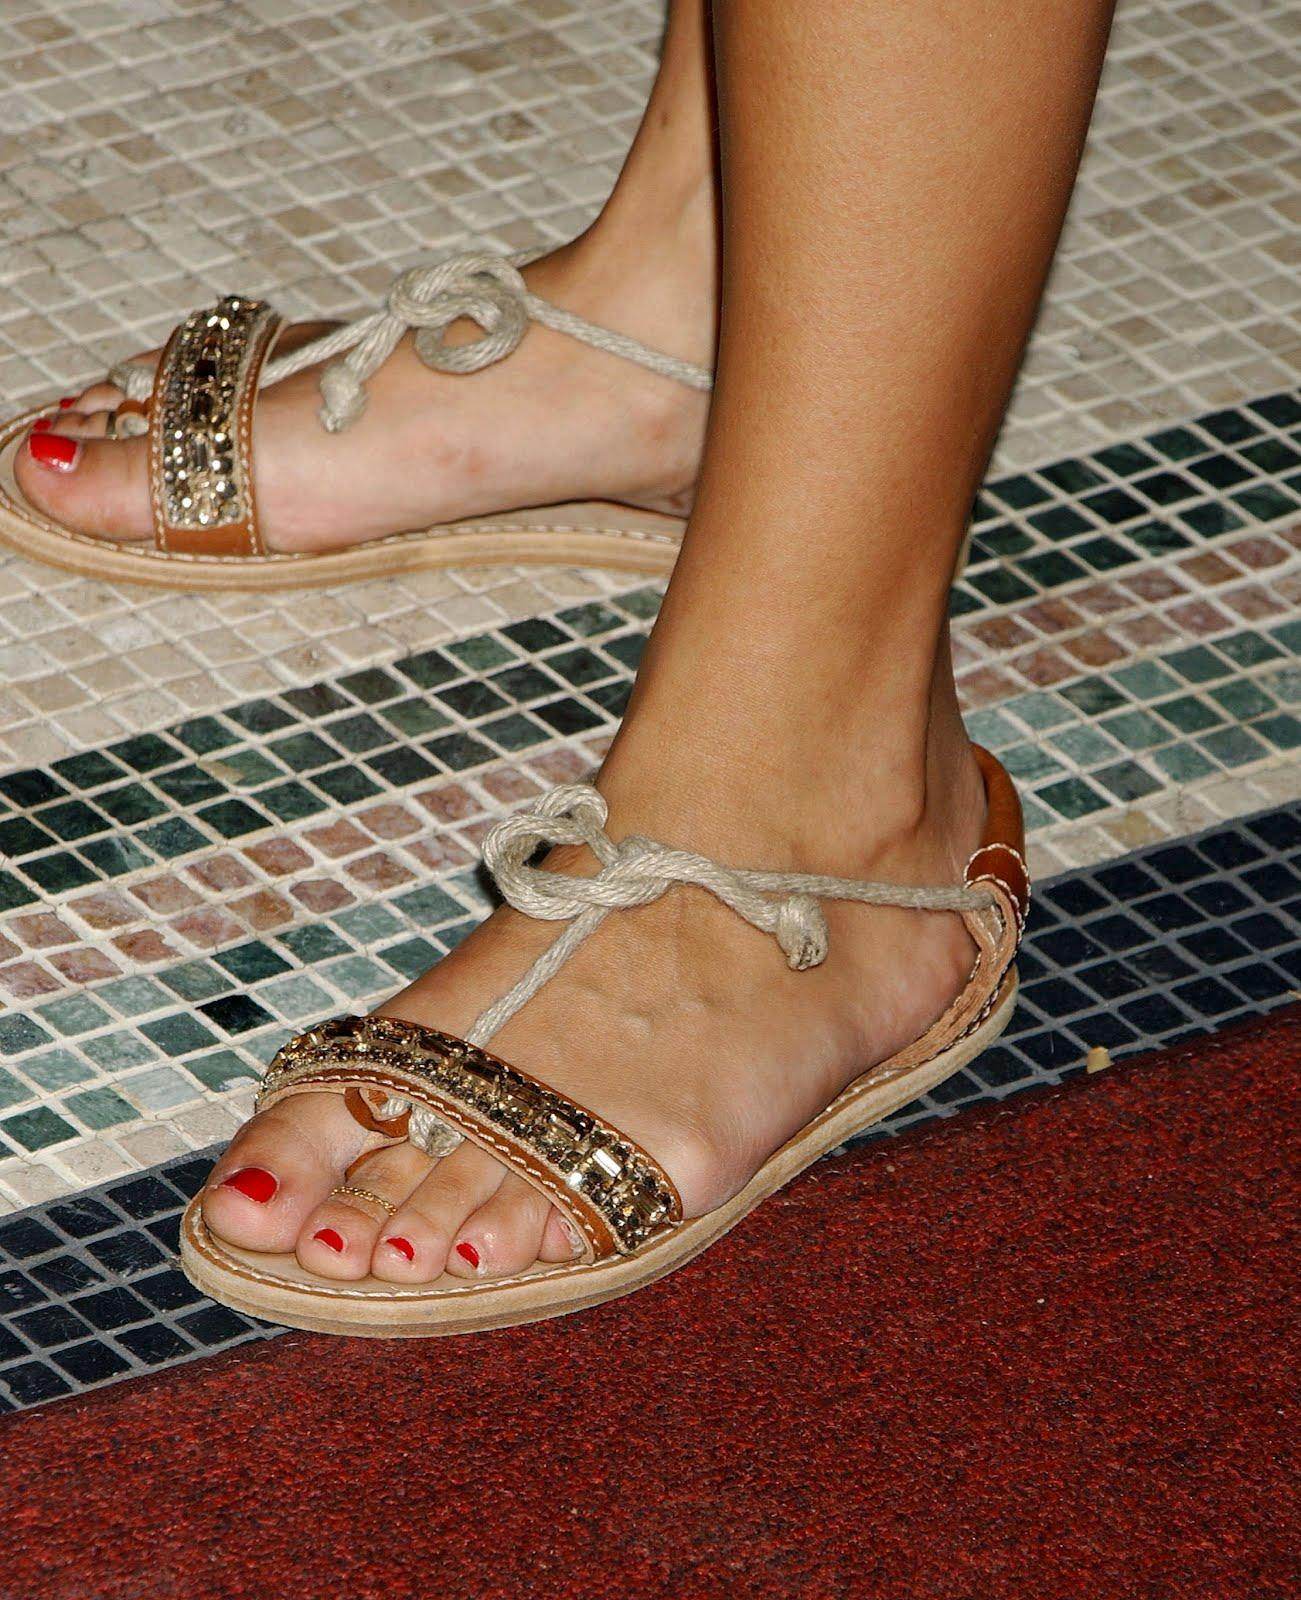 http://4.bp.blogspot.com/-1TwBmuK3dtE/UBp783d0F8I/AAAAAAAAAQs/JICPRp7ALrM/s1600/Rashida_Jones_Feet_001.jpg